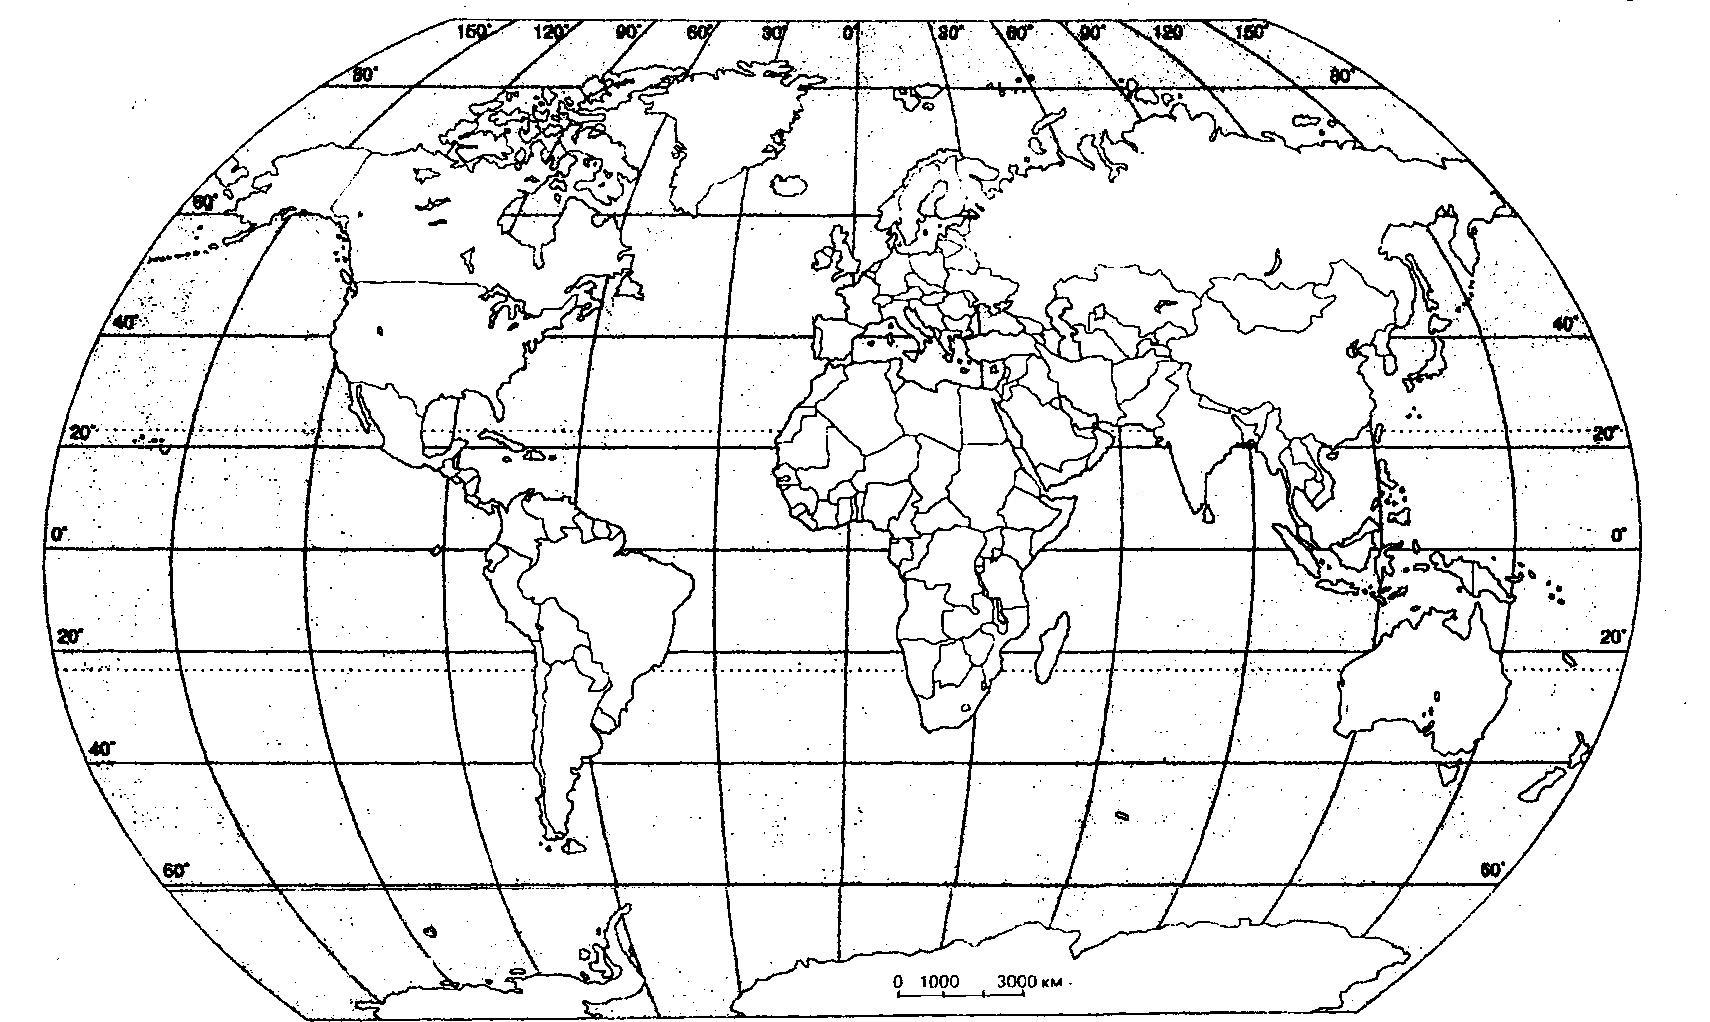 Контурна карта світу: політична карта - 1 Квітня 2015 ...: http://geografica.net.ua/blog/konturna_karta_svitu_politichna_karta/2015-04-01-78